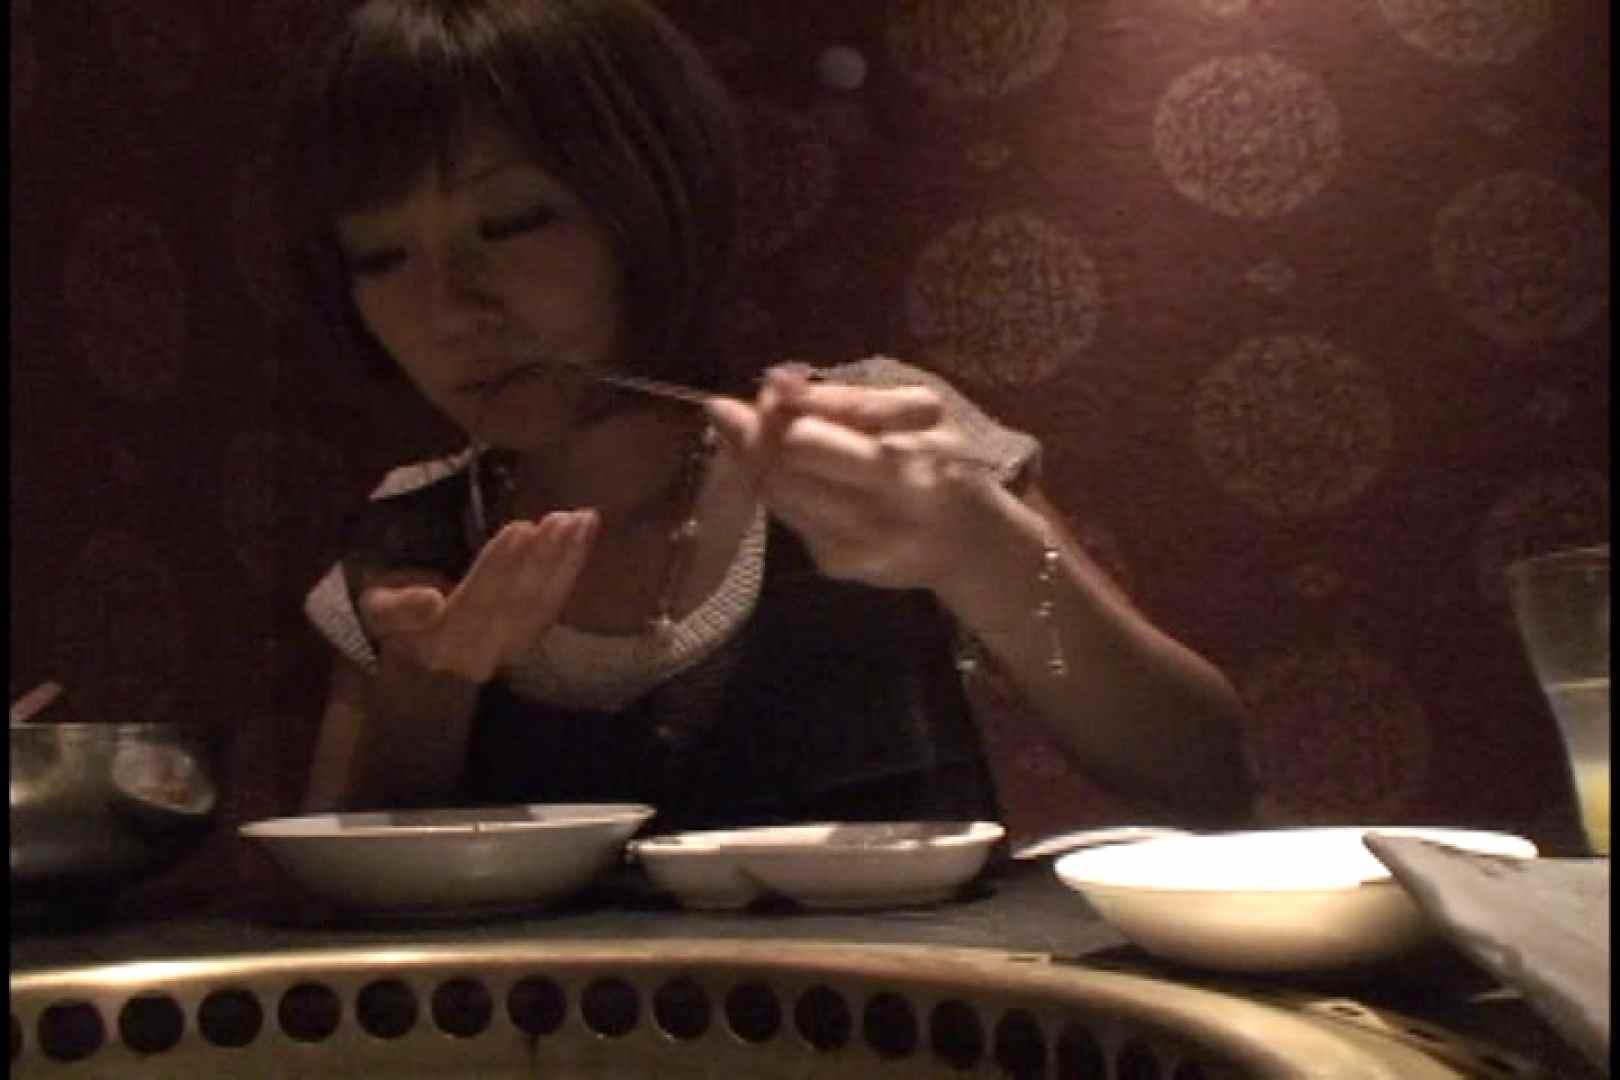 JDハンター全国ツアー vol.026 前編 女子大生のエロ動画  82PIX 50